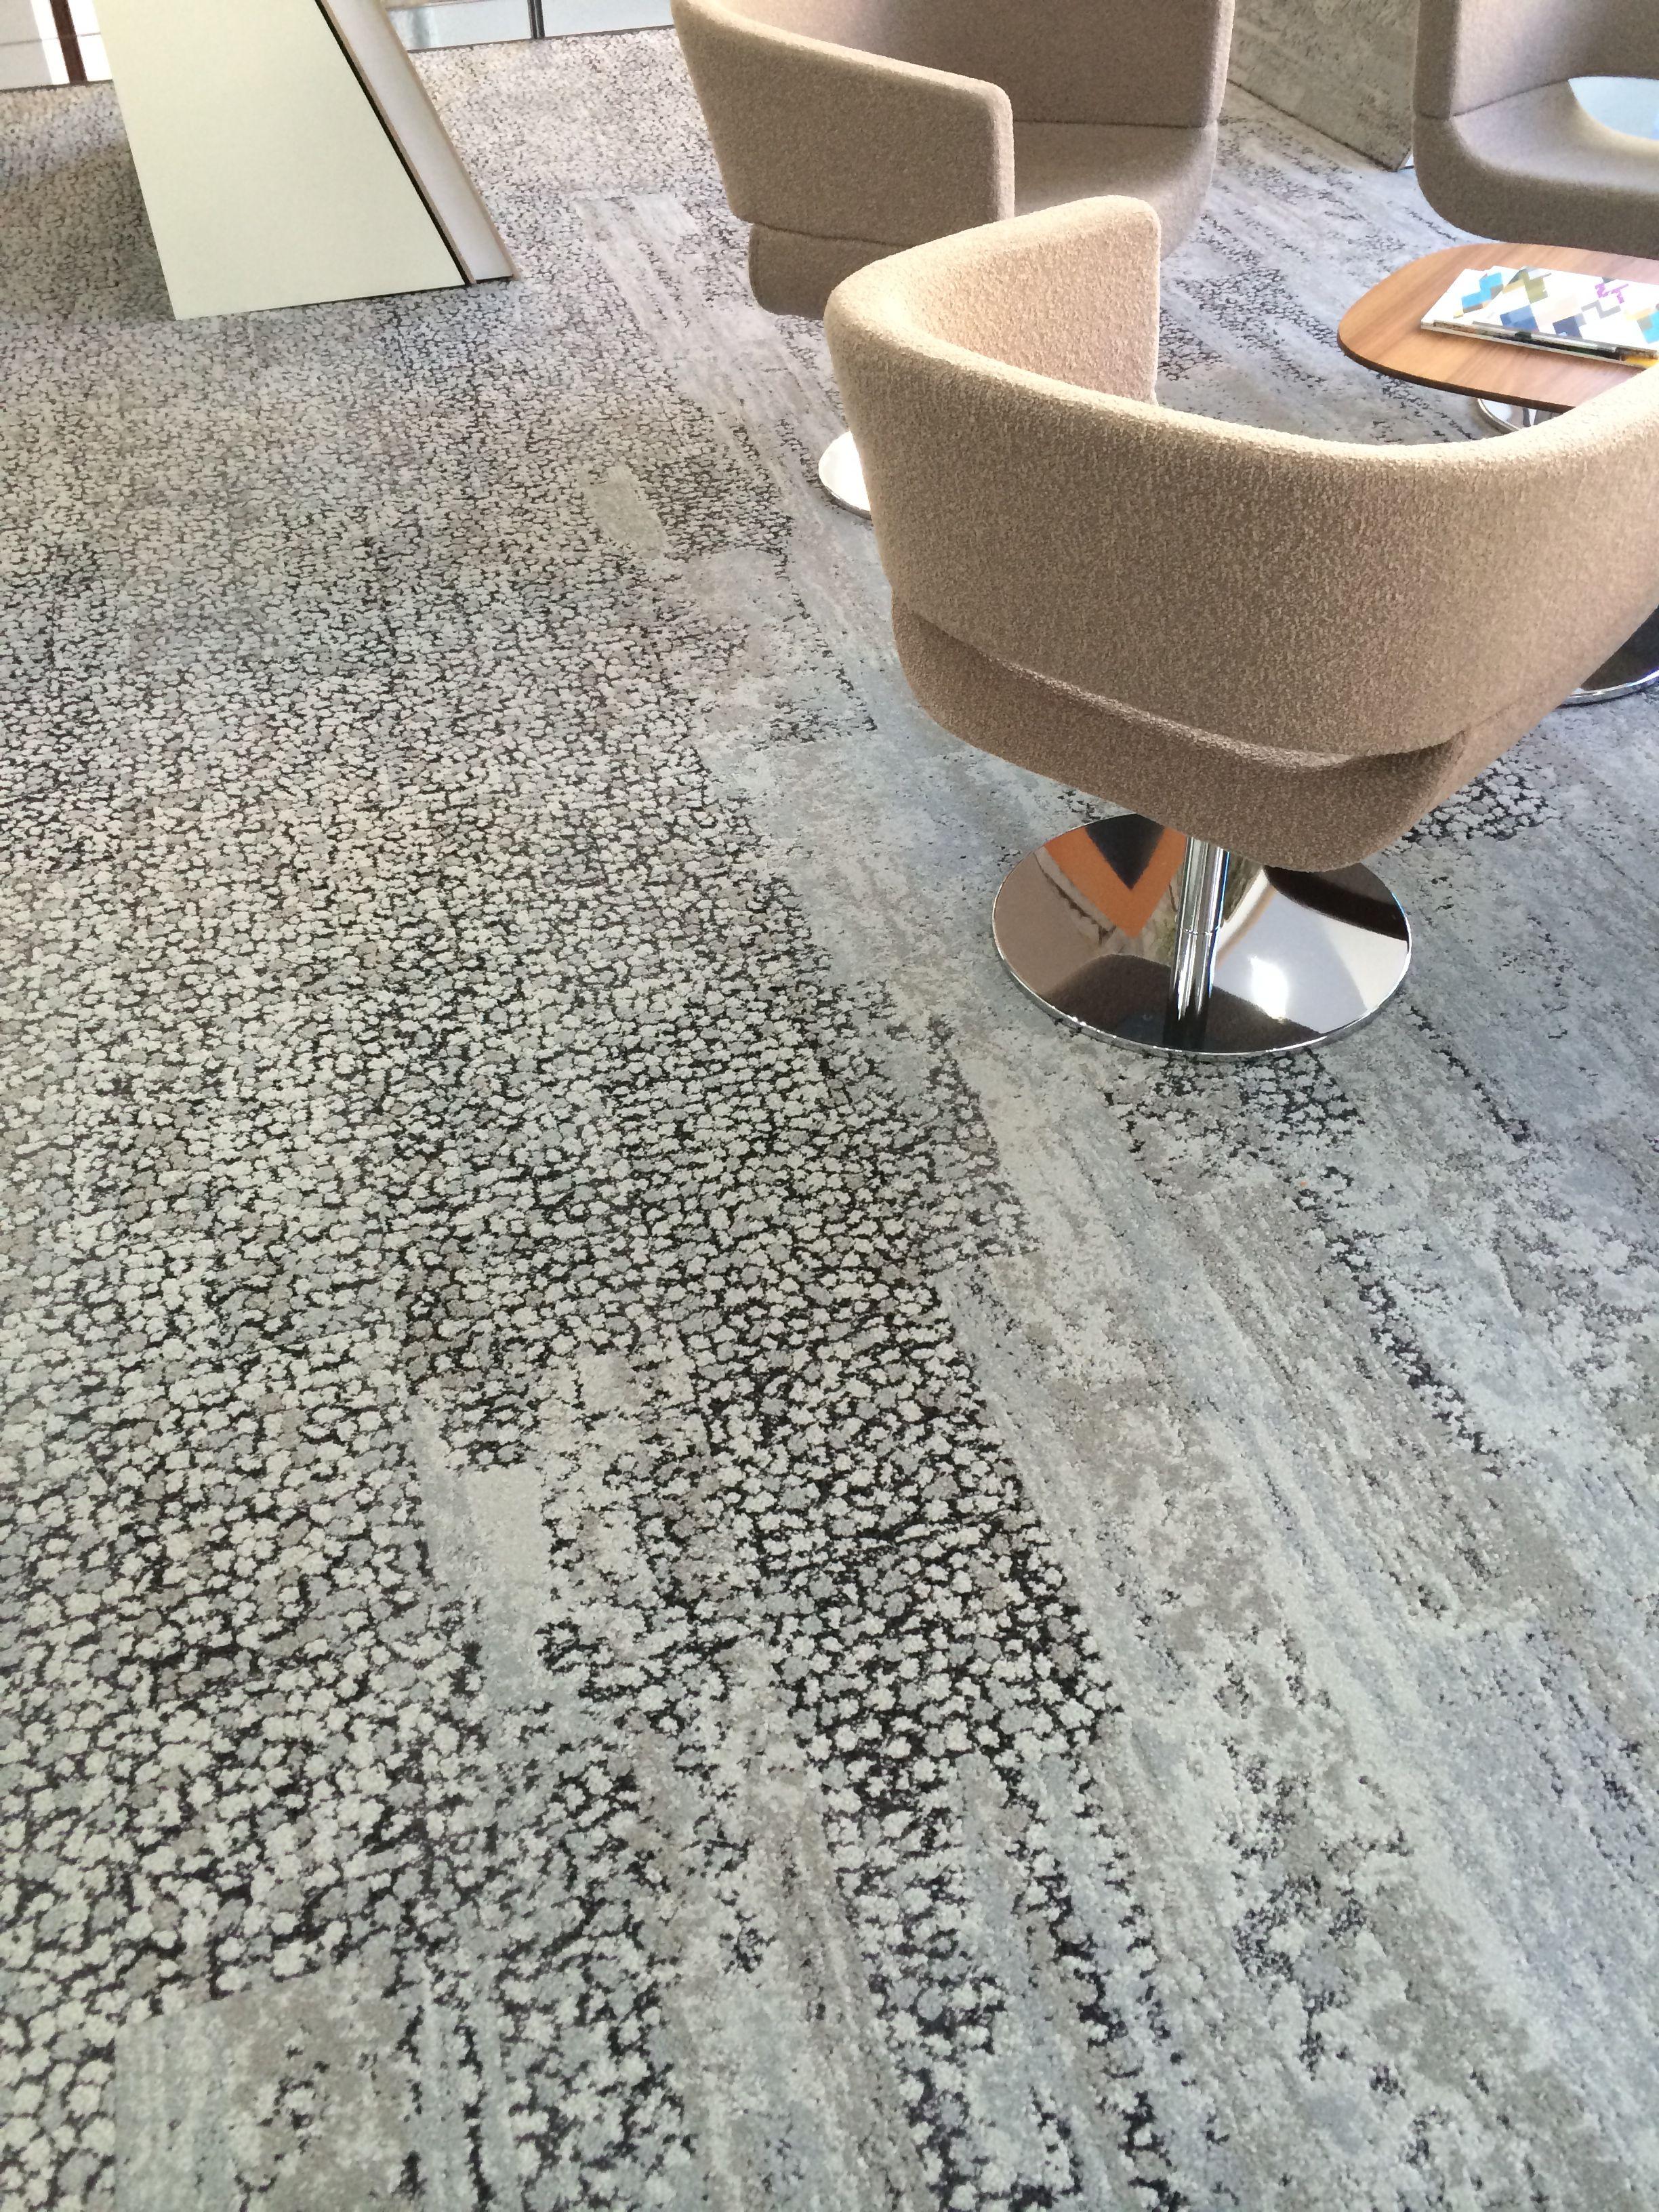 Carpet Tile Planks Human Nature By Interface Available At Creedmiles Carpet Tiles Design Carpet Tiles Office Carpet